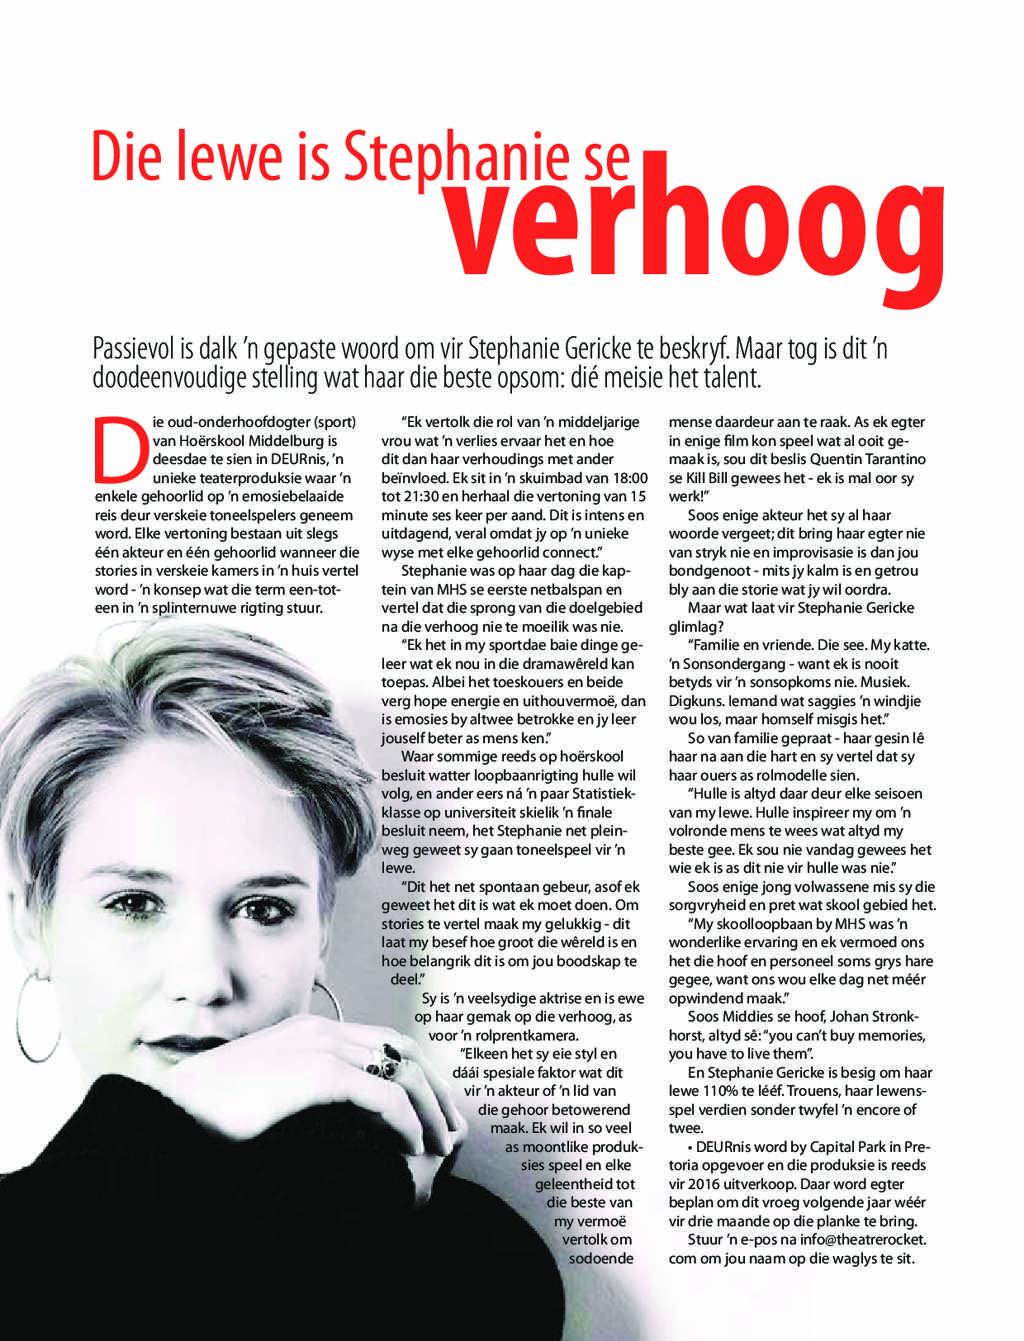 get-it-middelburg-december-2016-epapers-page-30